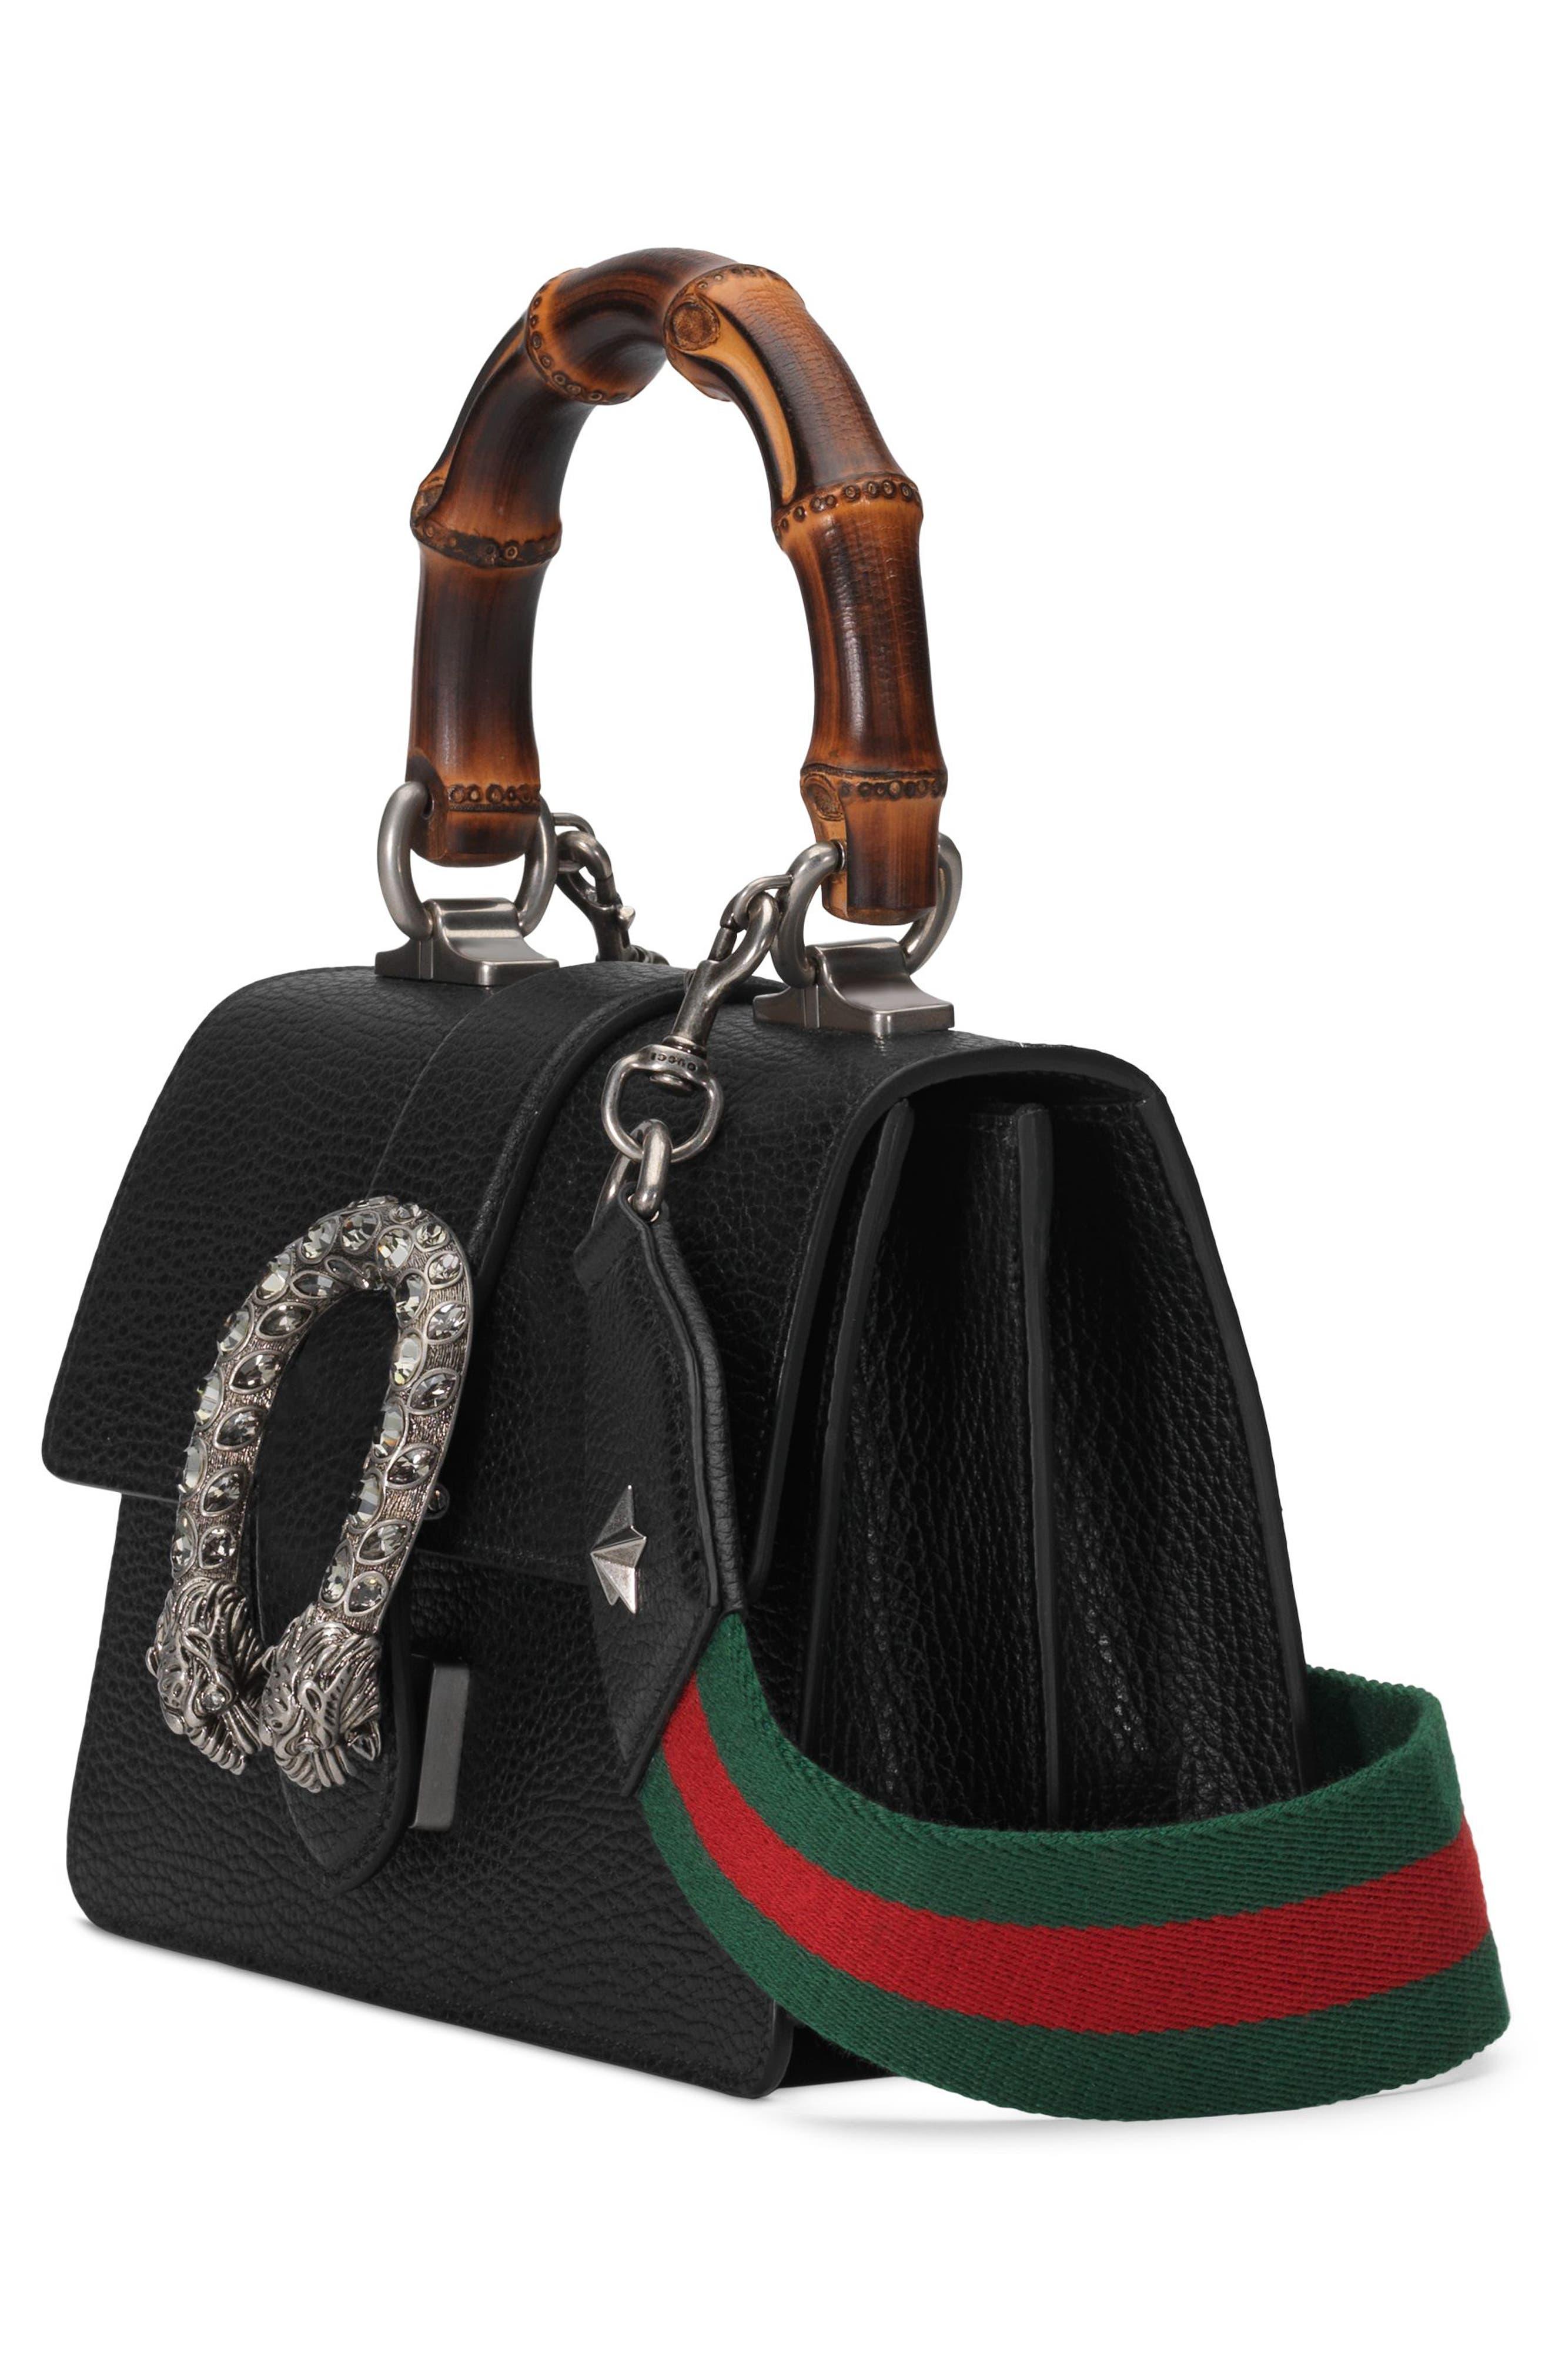 Mini Dionysus Leather Top Handle Satchel,                             Alternate thumbnail 4, color,                             NERO/ VERT RED/ BLACK DIAMOND